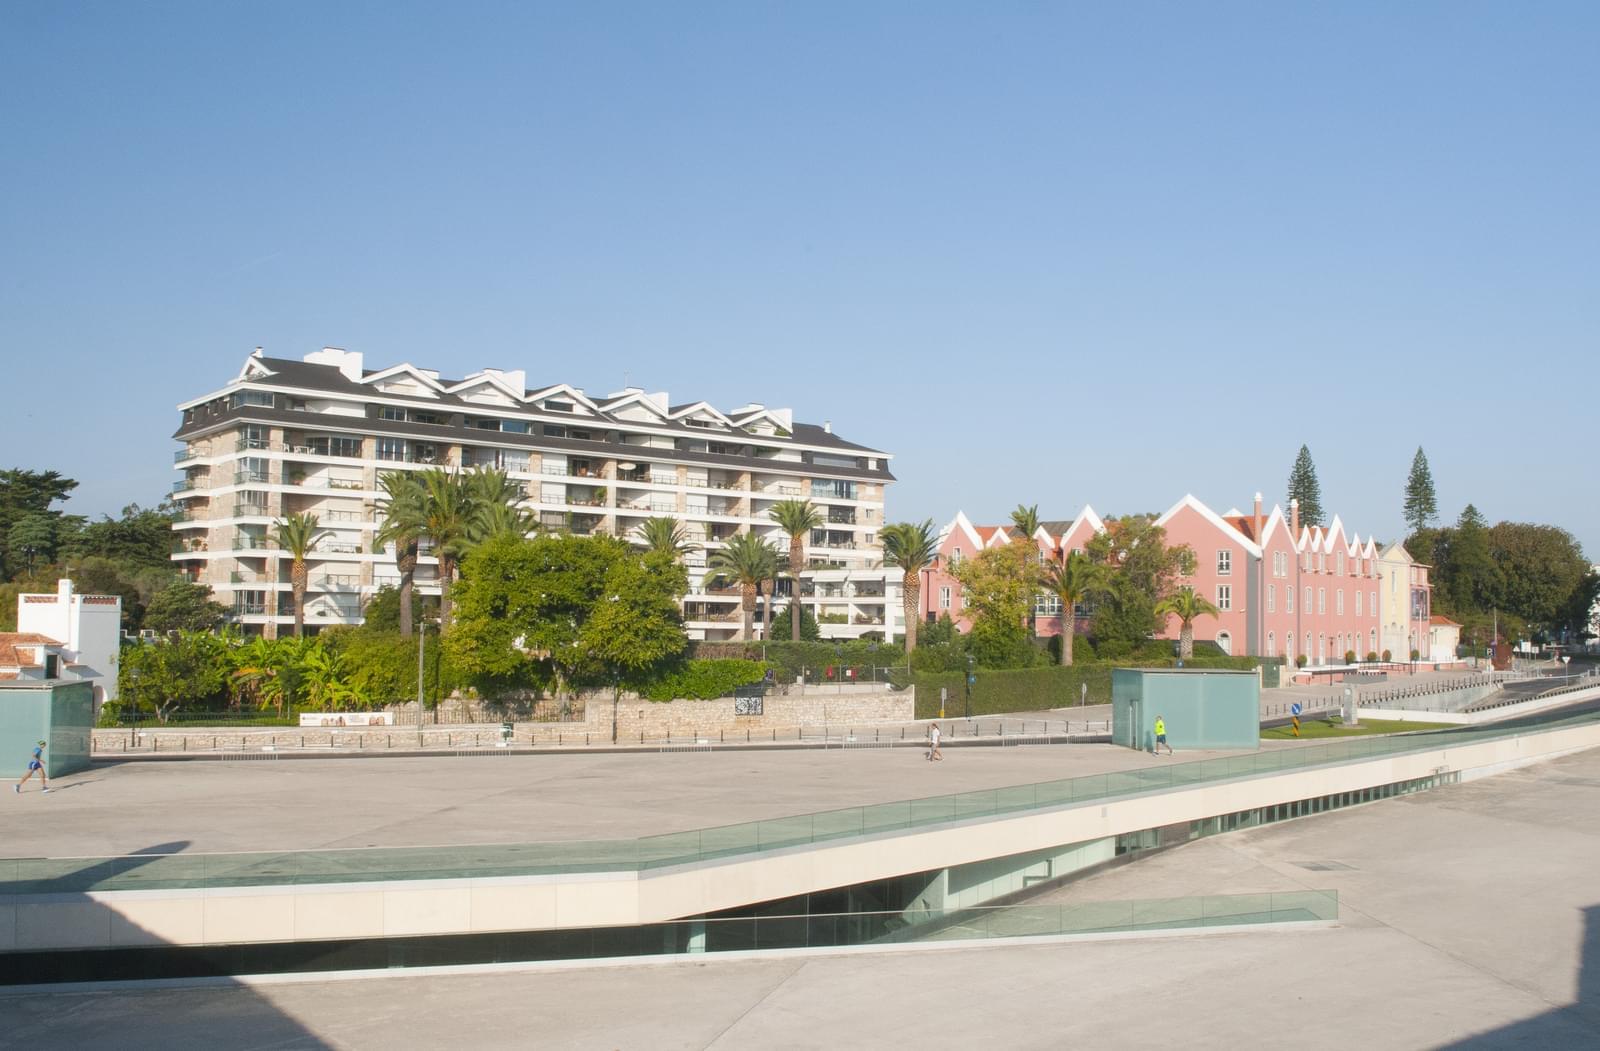 pf17830-apartamento-t2-cascais-9c24e21b-5aef-486d-abd5-bc135817f351